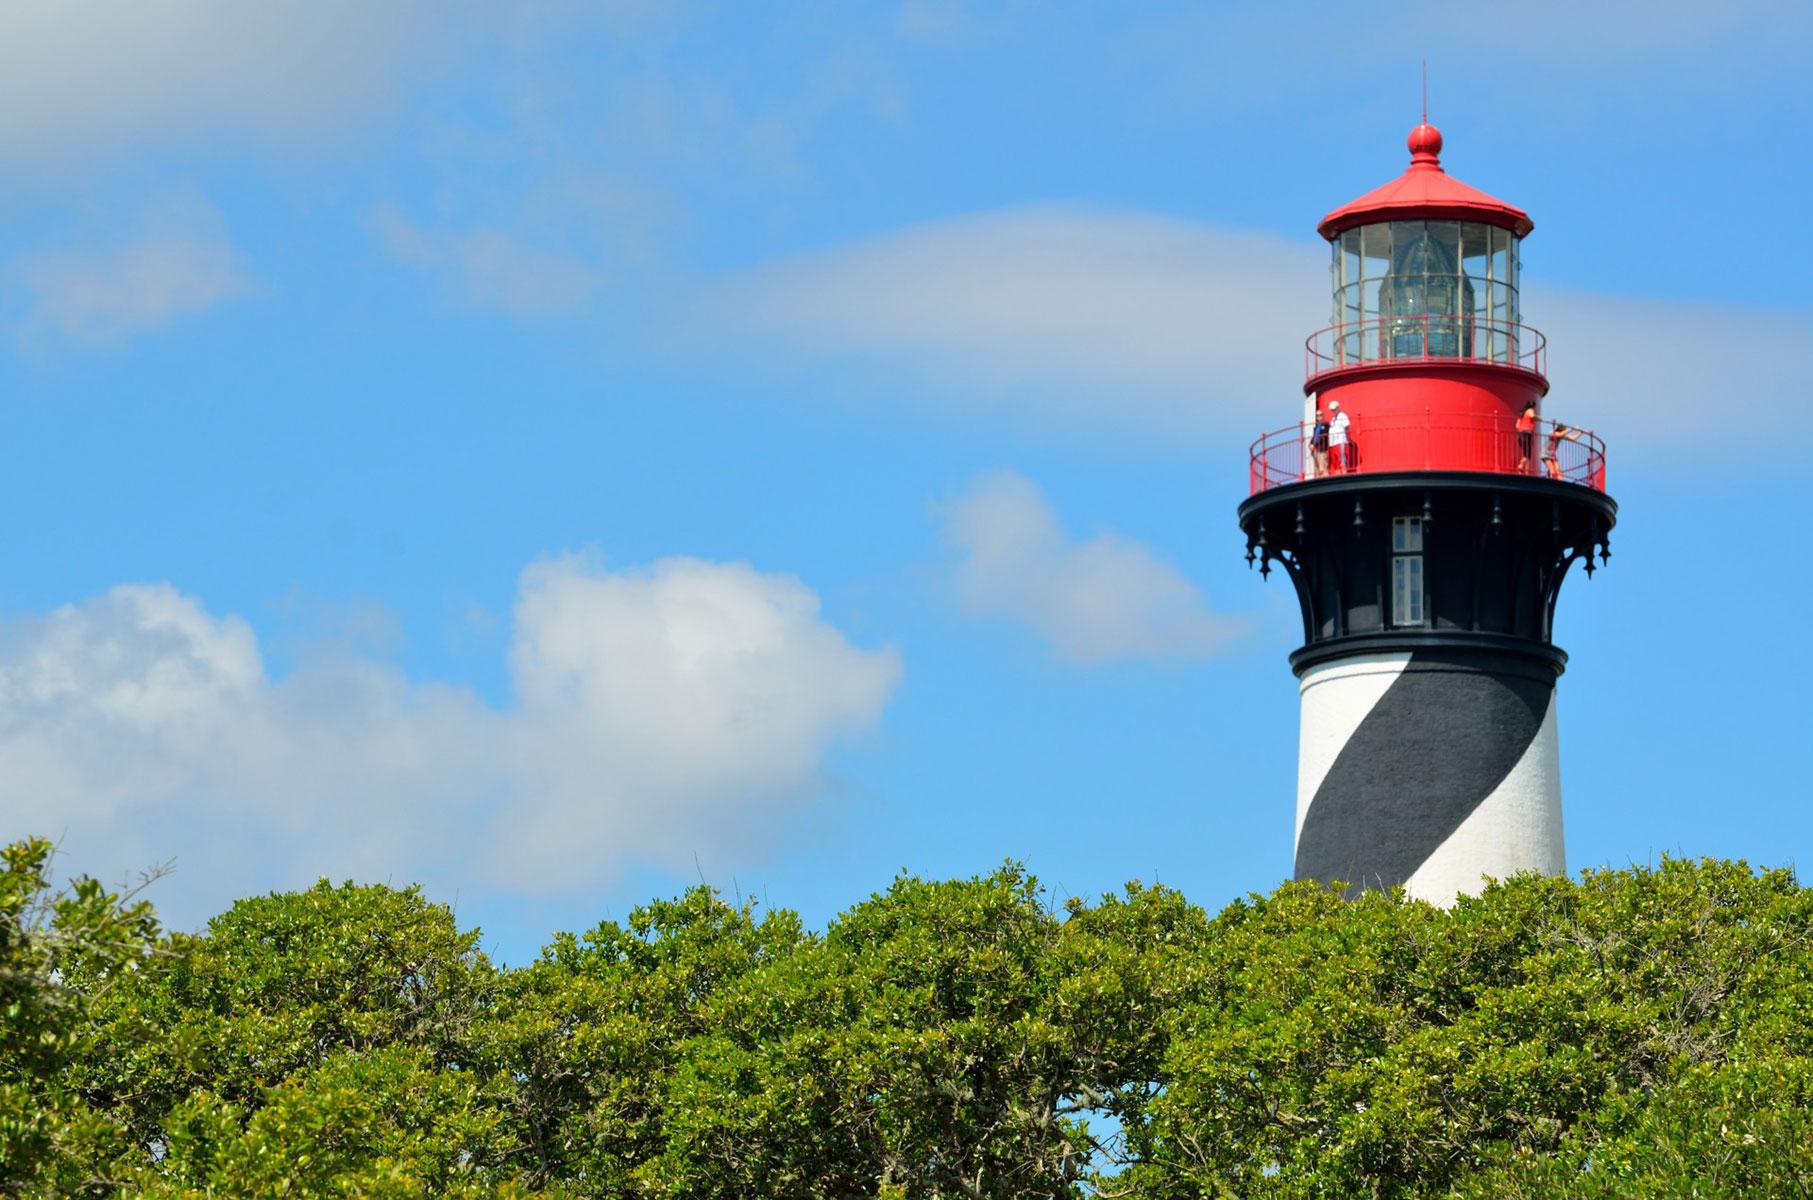 St Augustine Lighthouse Florida Tnemec Fluoronar Lumiflon FEVE Resin